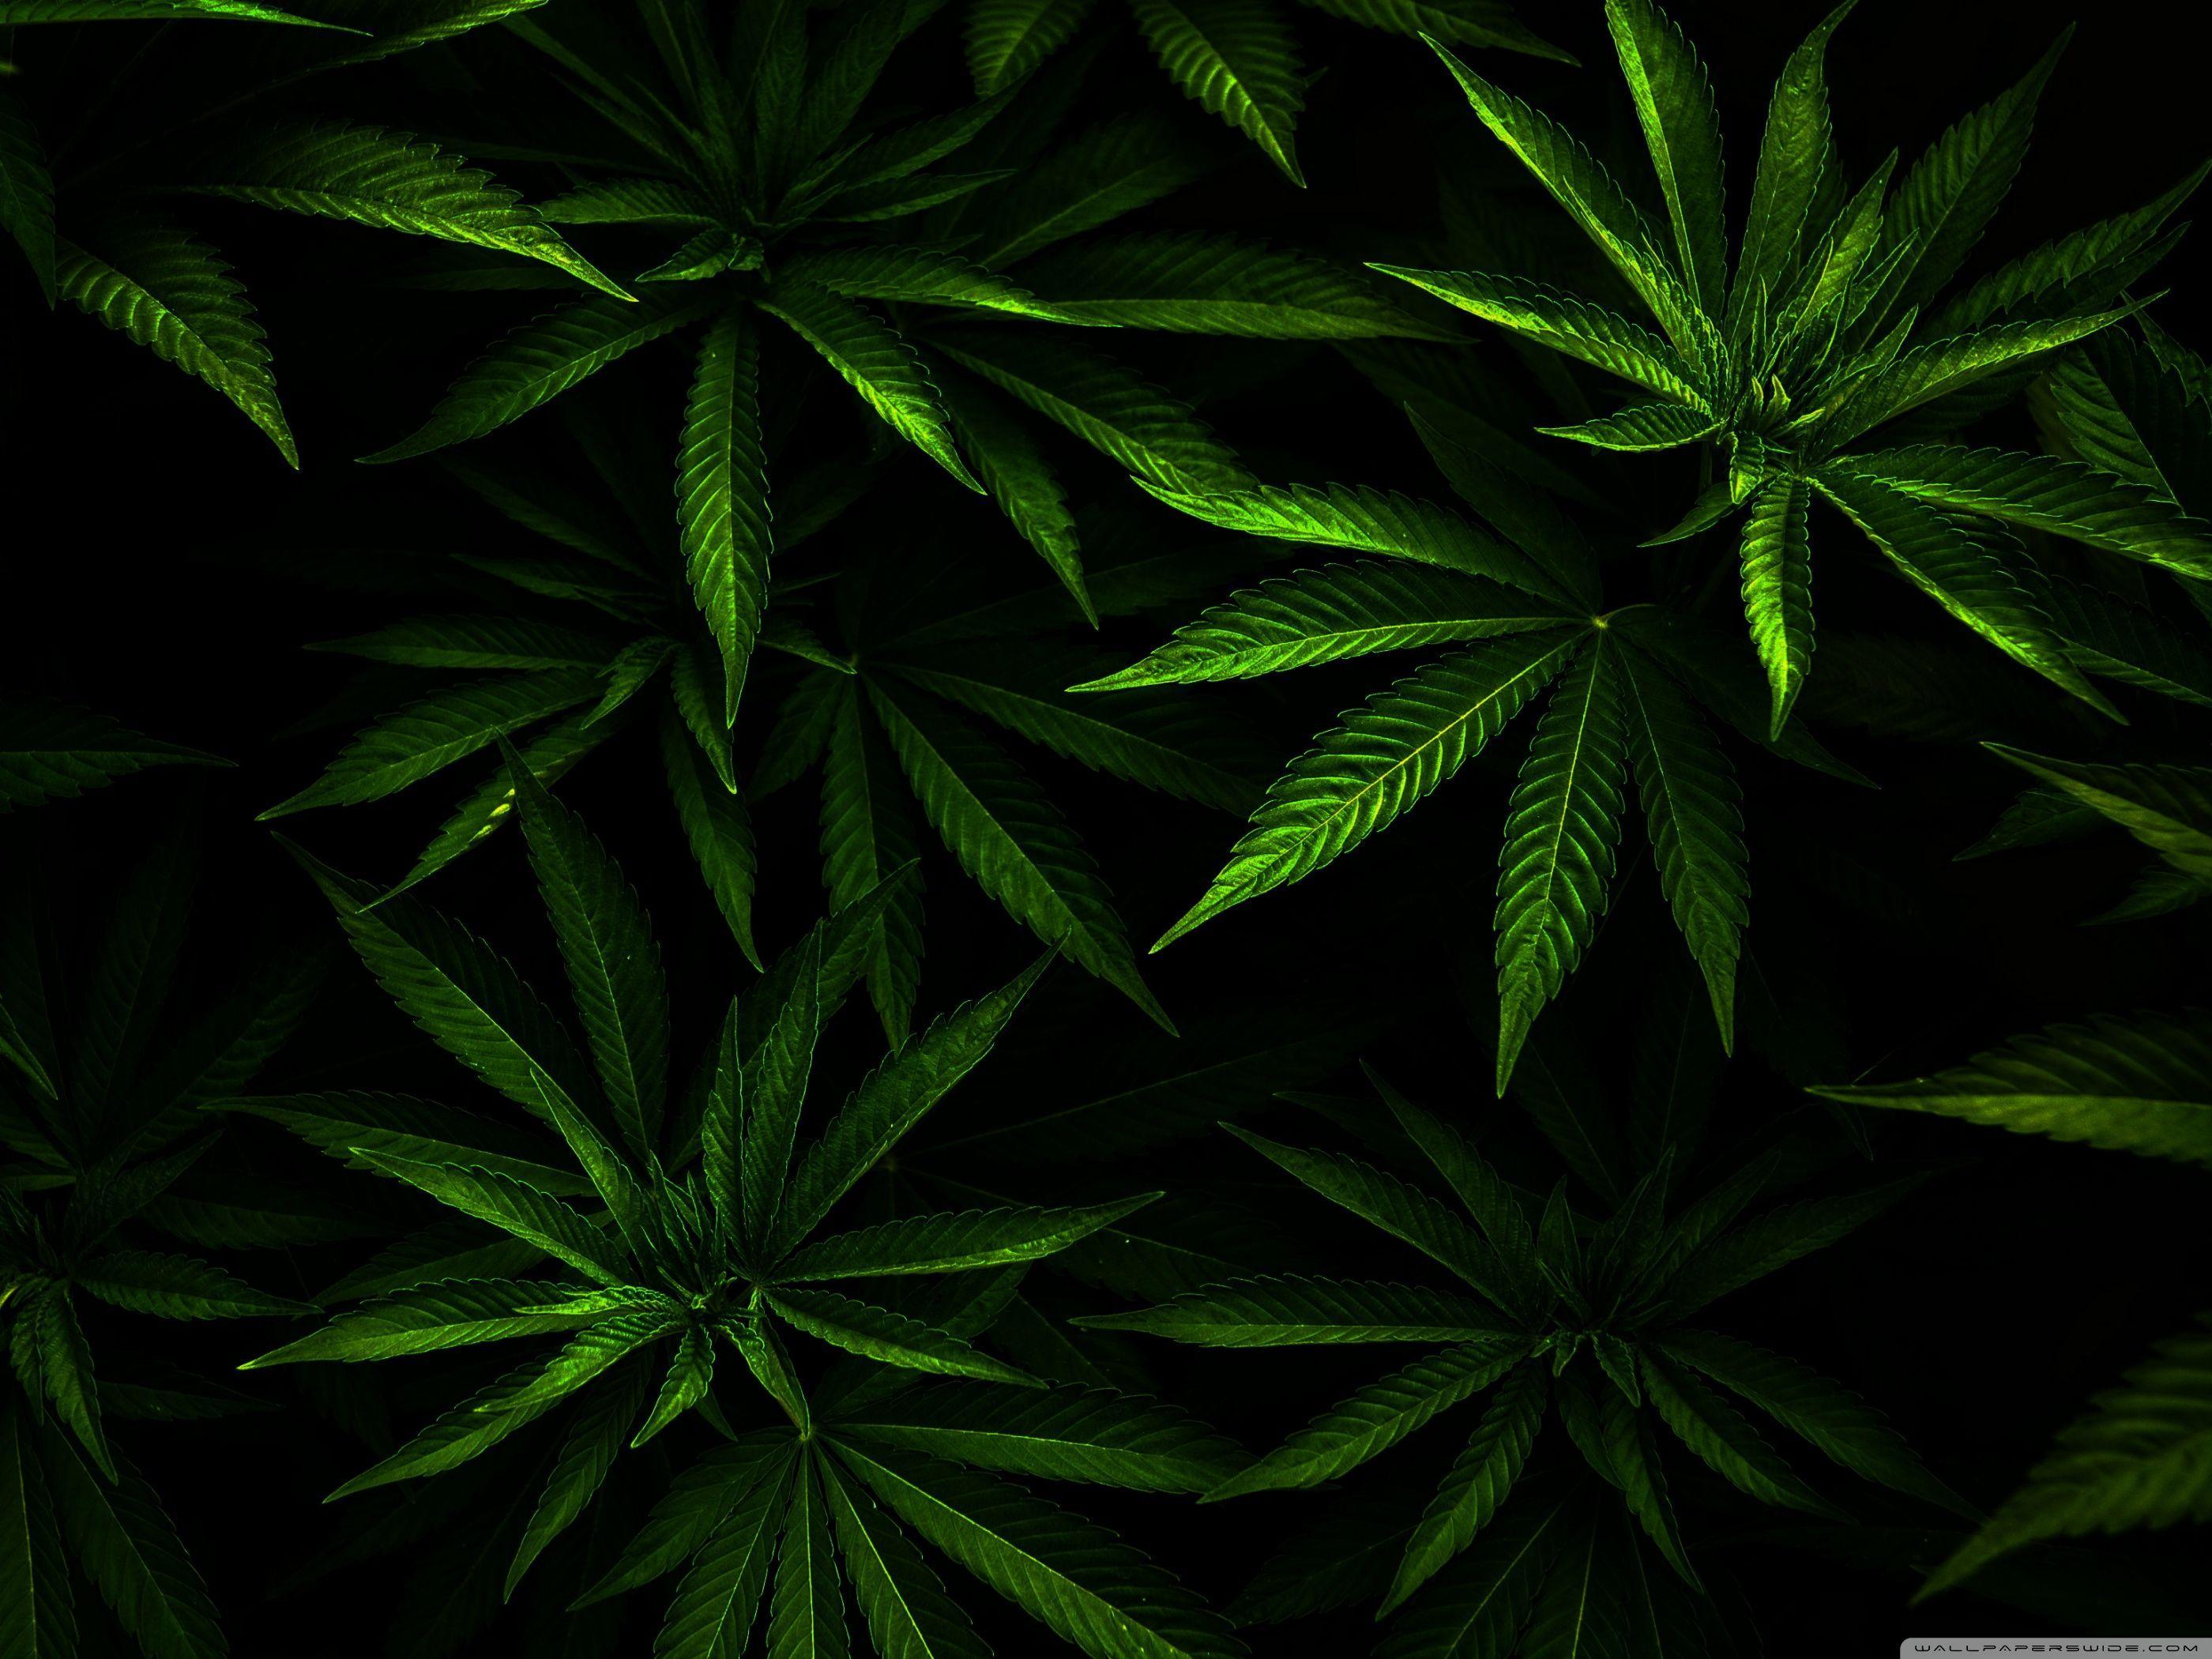 Download Weed Wallpaper 3A6 | Verdewall